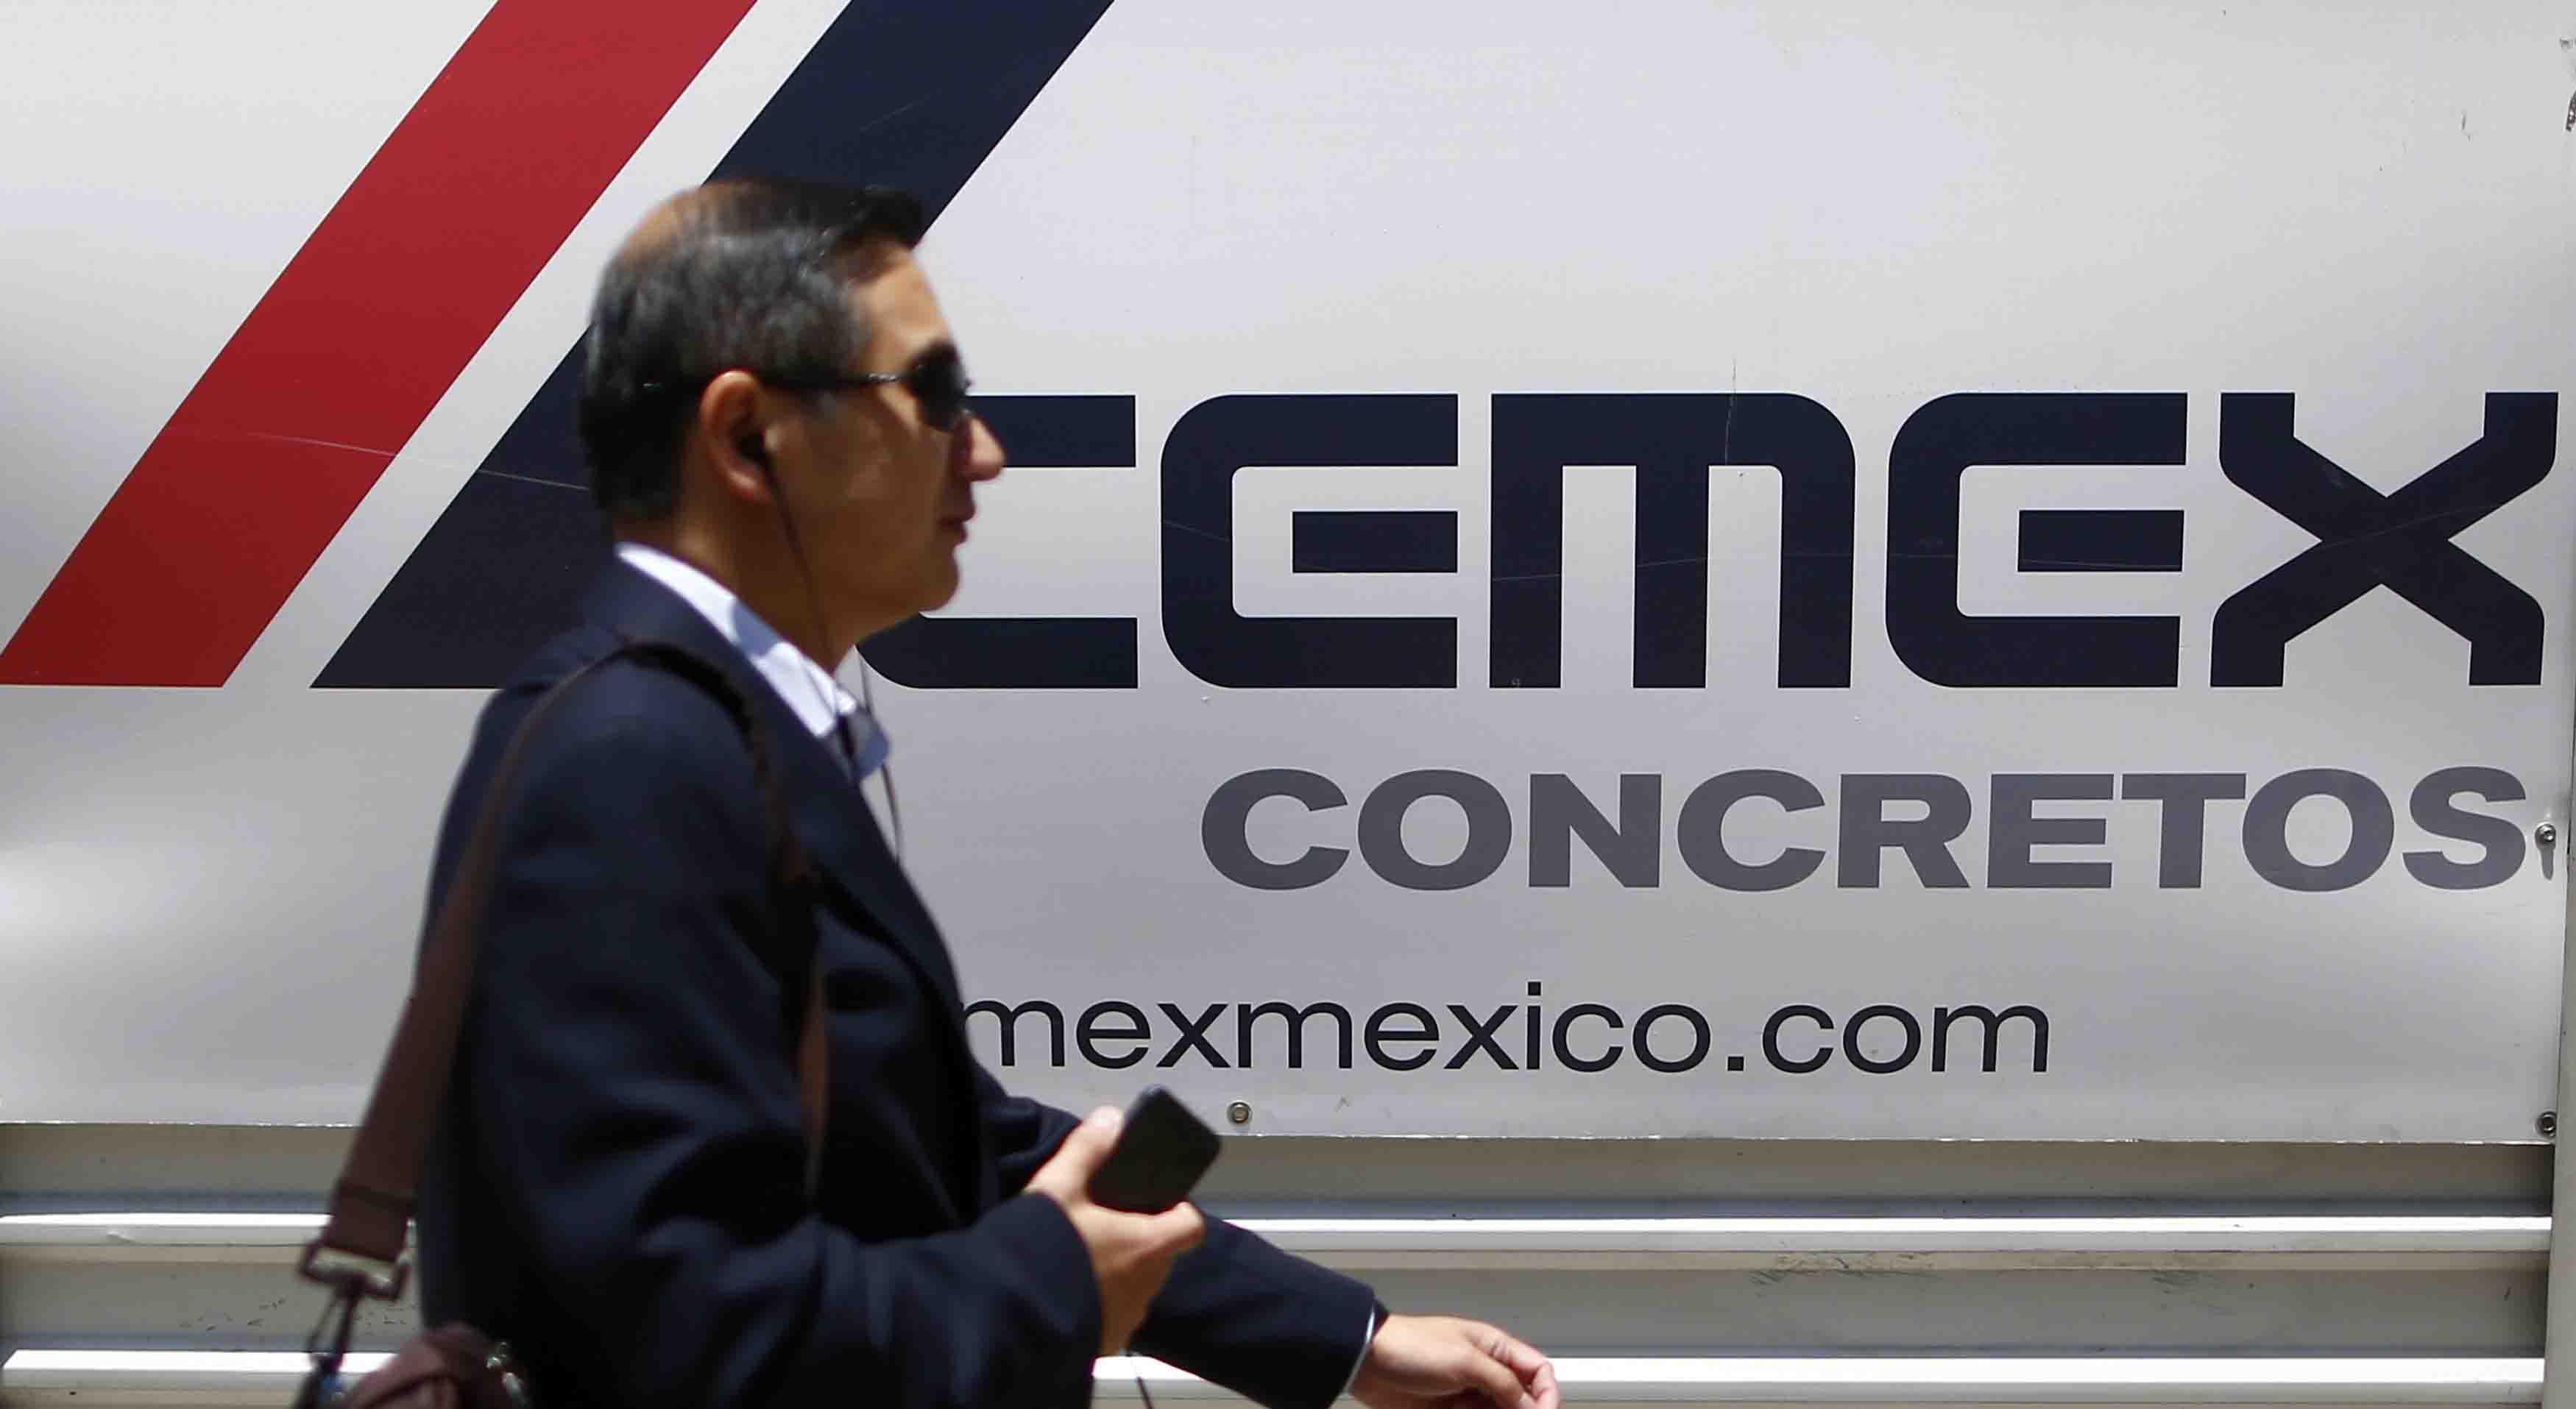 Ganancia de Cemex Latam cae 20% en primer trimestre